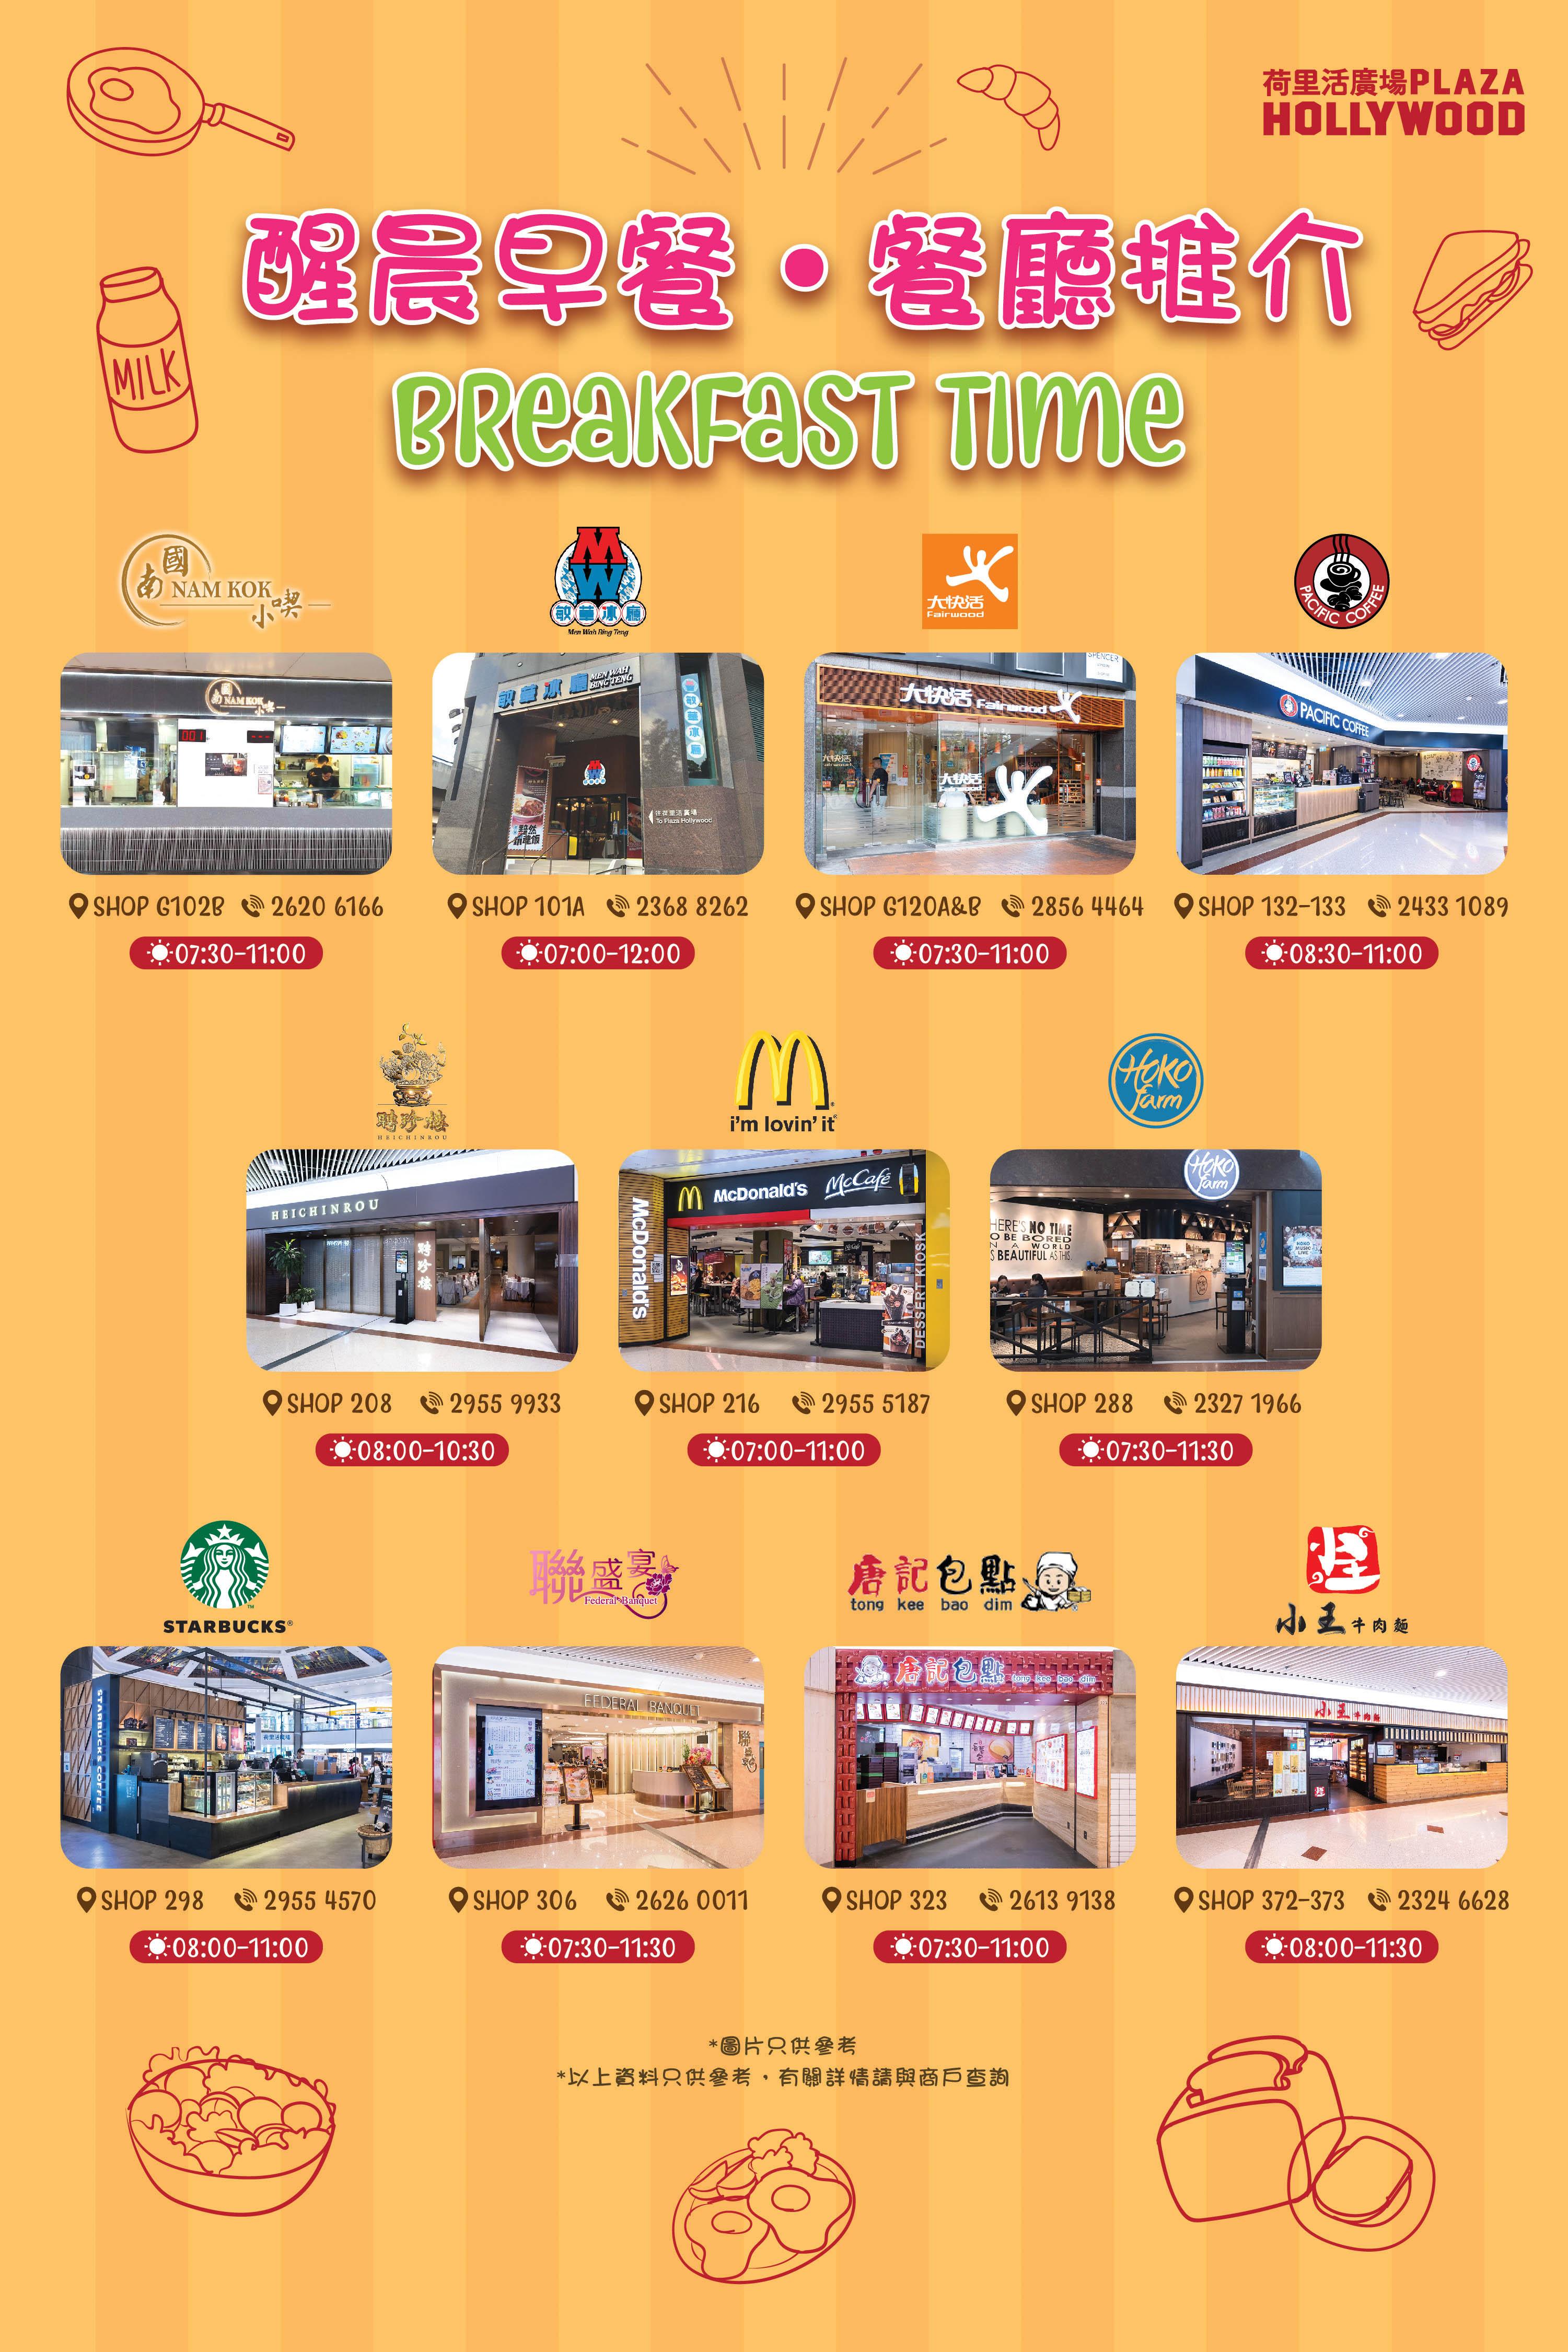 Breakfast Time Restaurants Guide